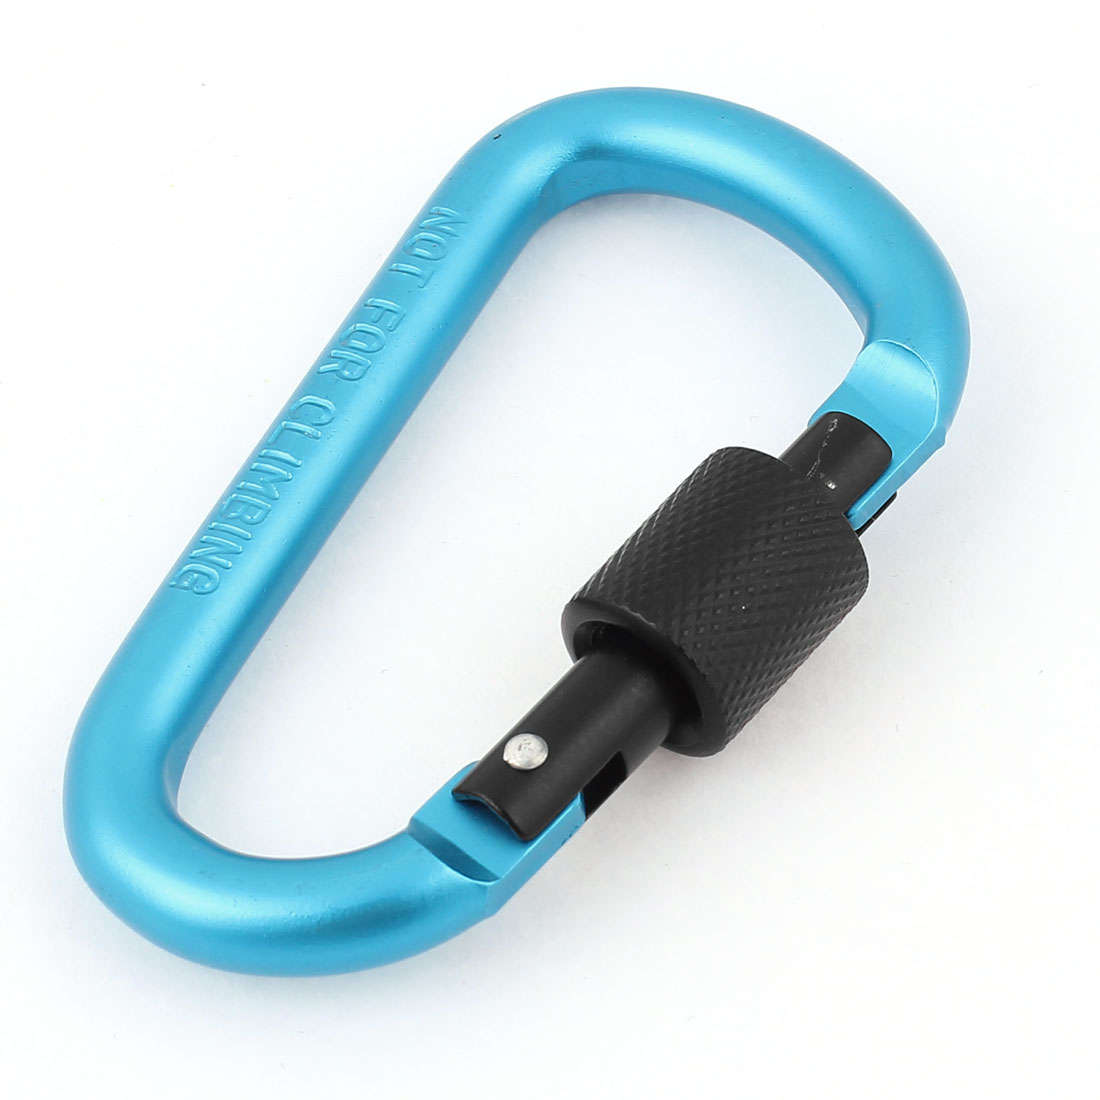 Camping D Shape Screw Lock Carabiner Snap Hook Karabiner Keychain Keyring Cyan